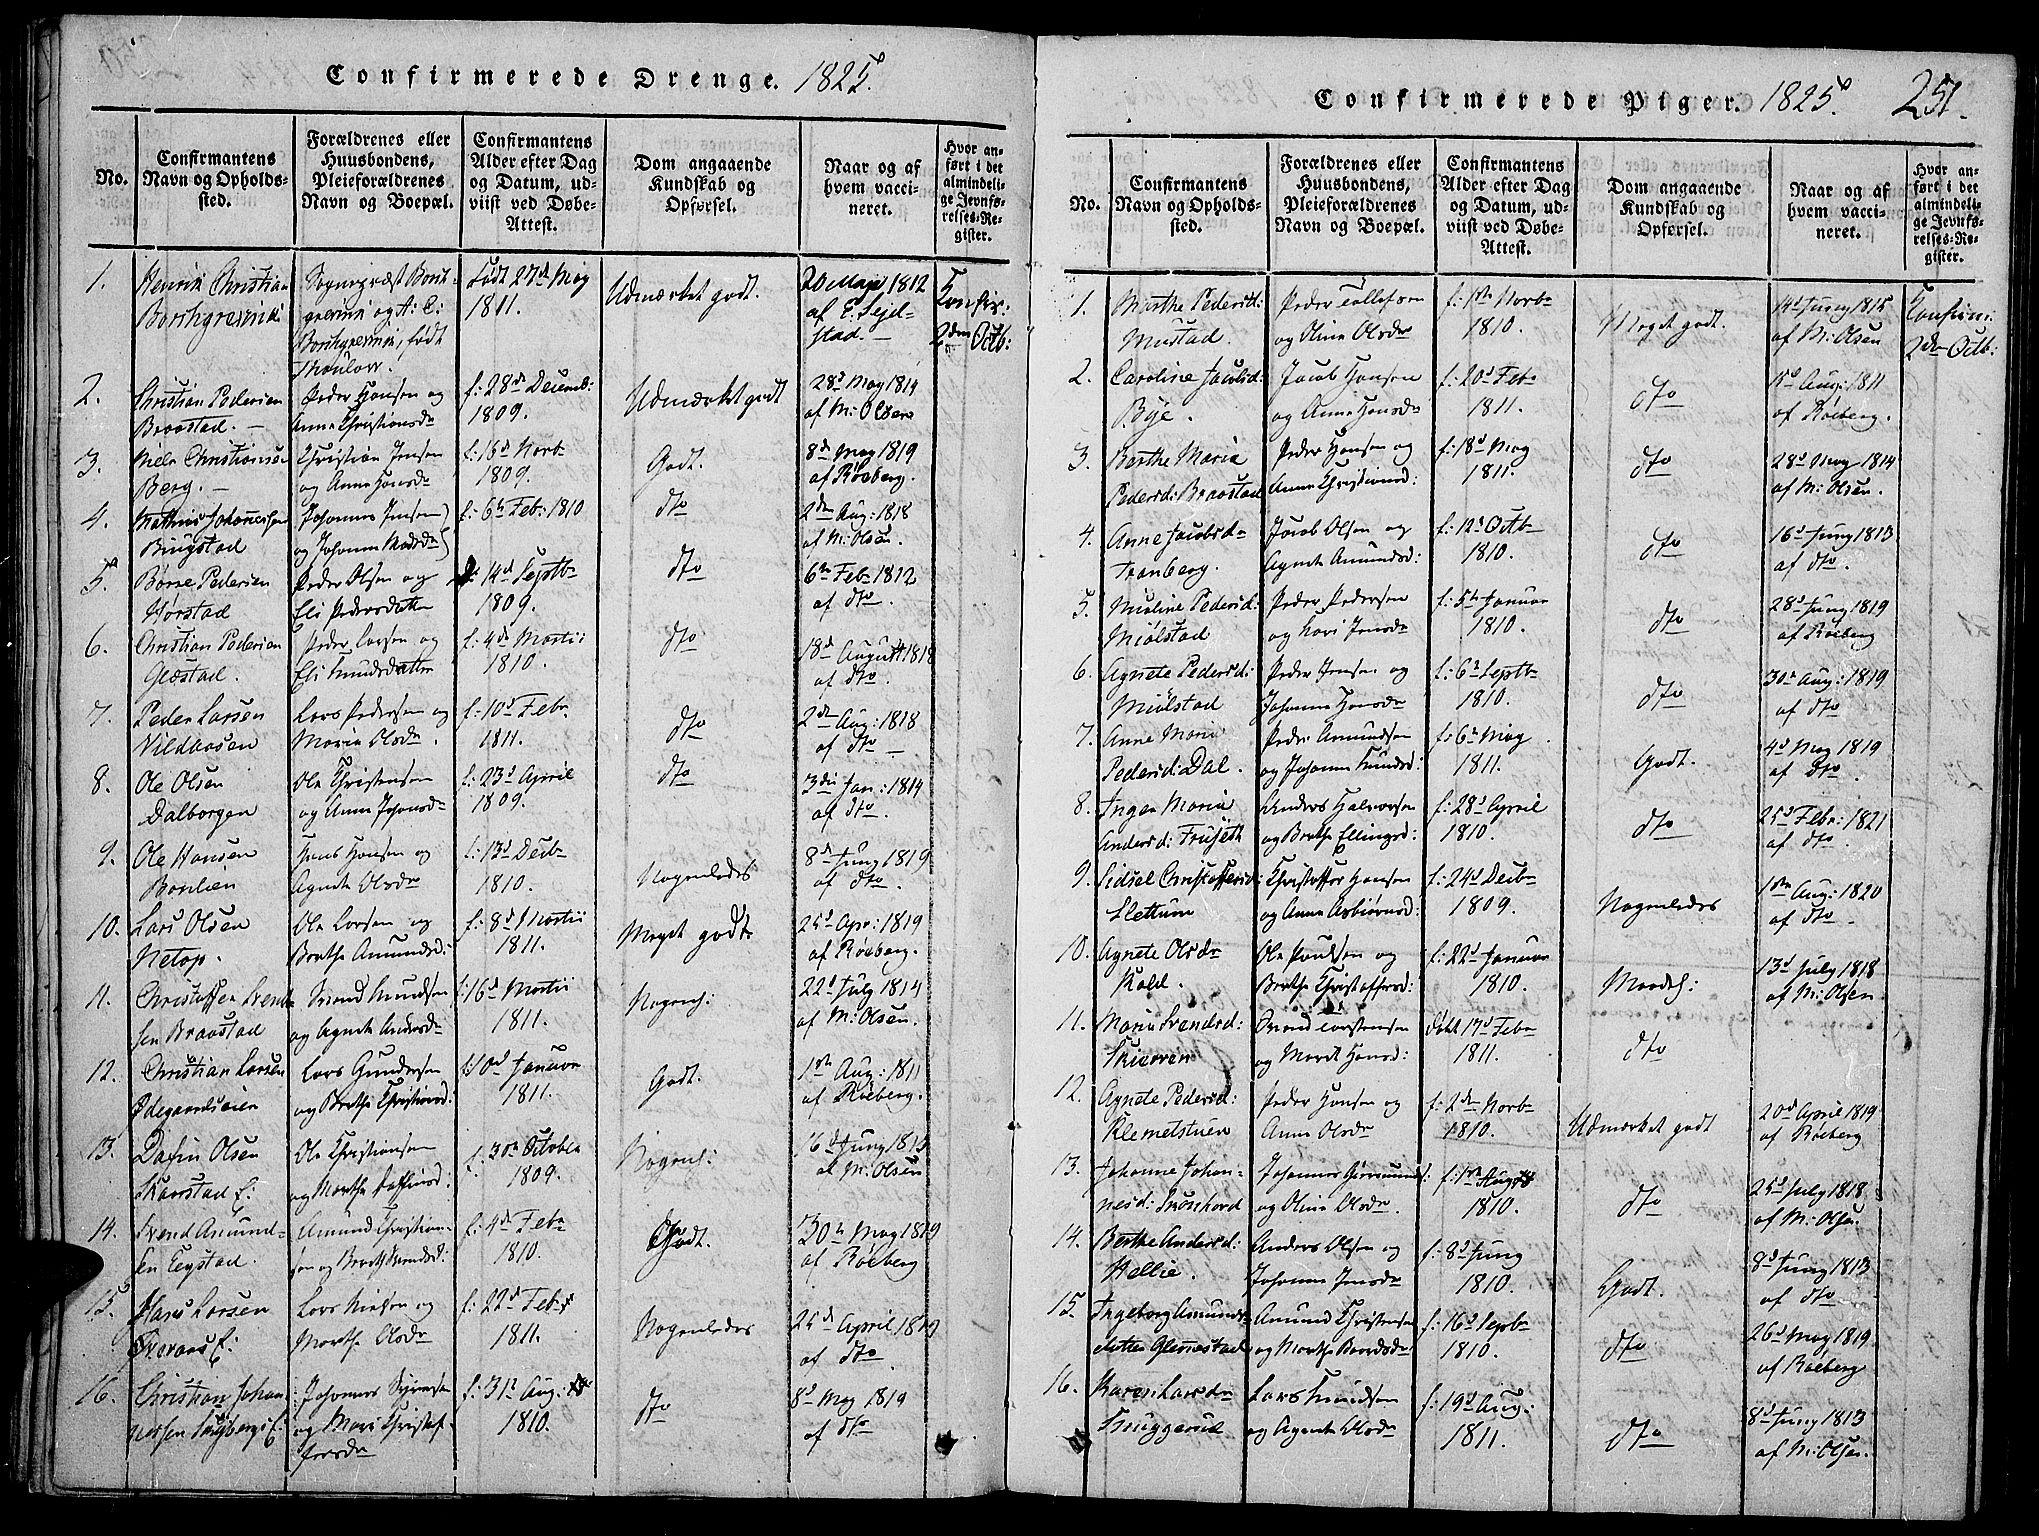 SAH, Vardal prestekontor, H/Ha/Haa/L0004: Ministerialbok nr. 4, 1814-1831, s. 251